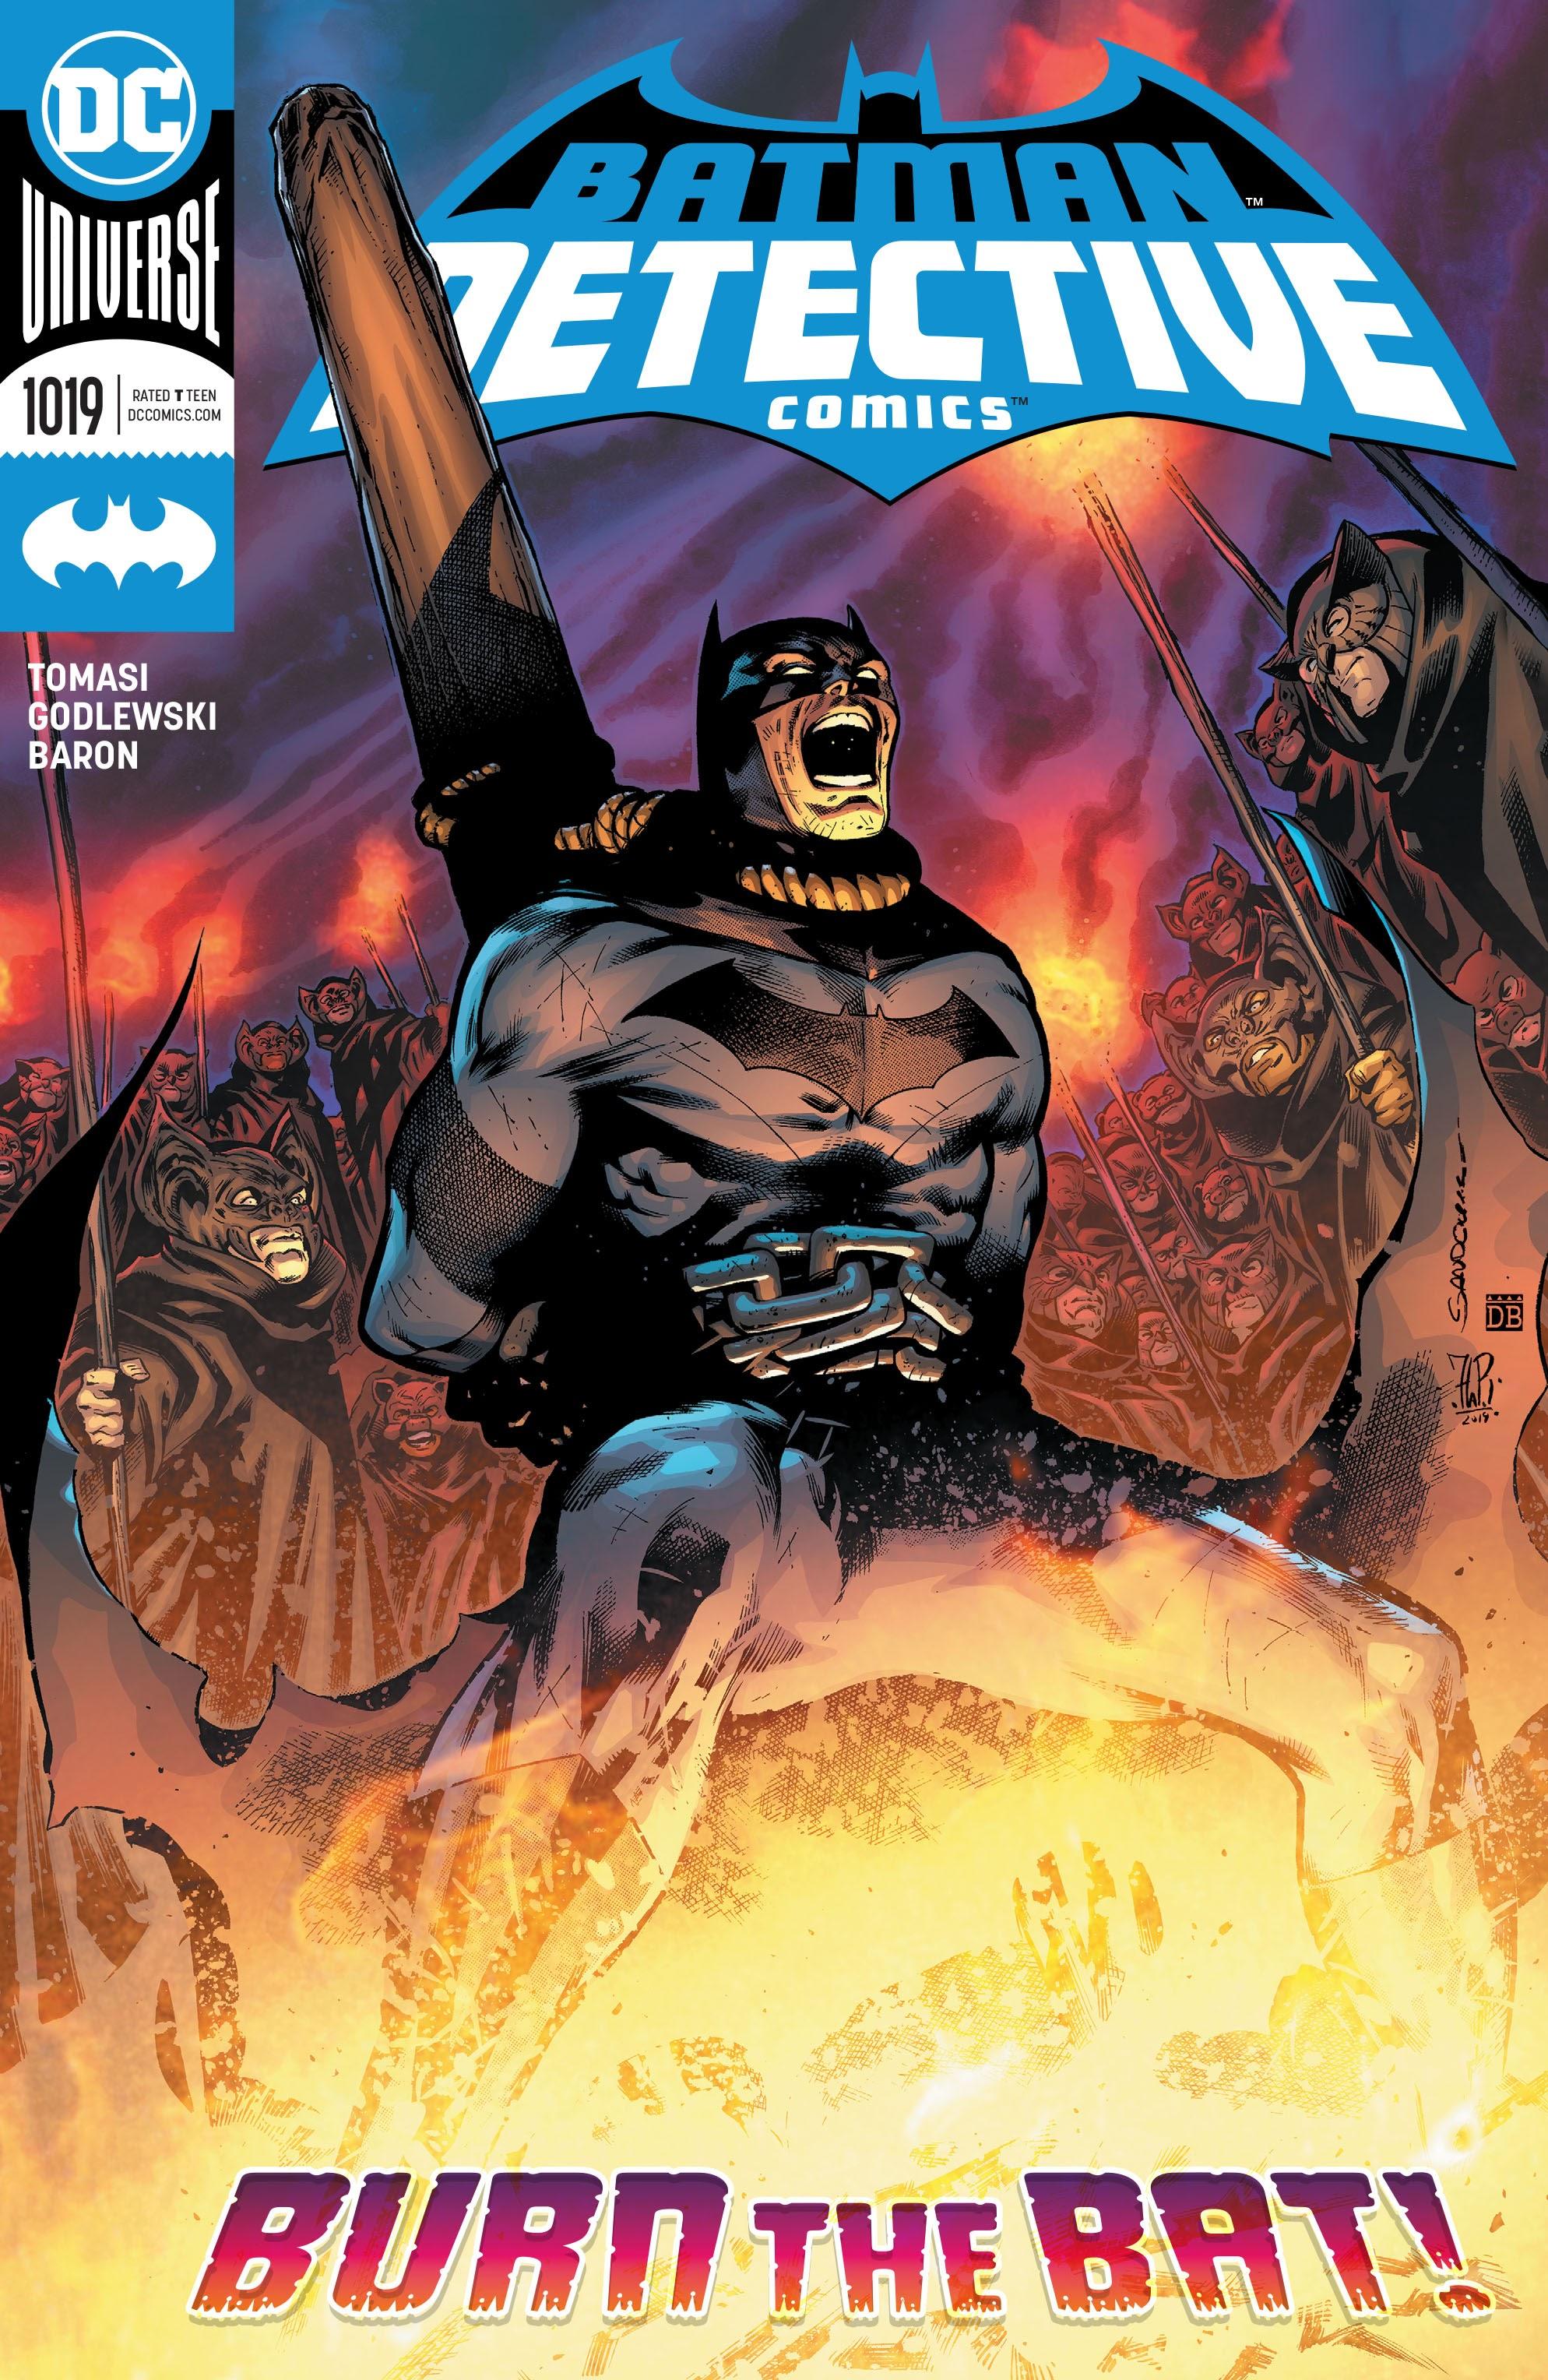 Detective Comics (2016) 1019 Page 1